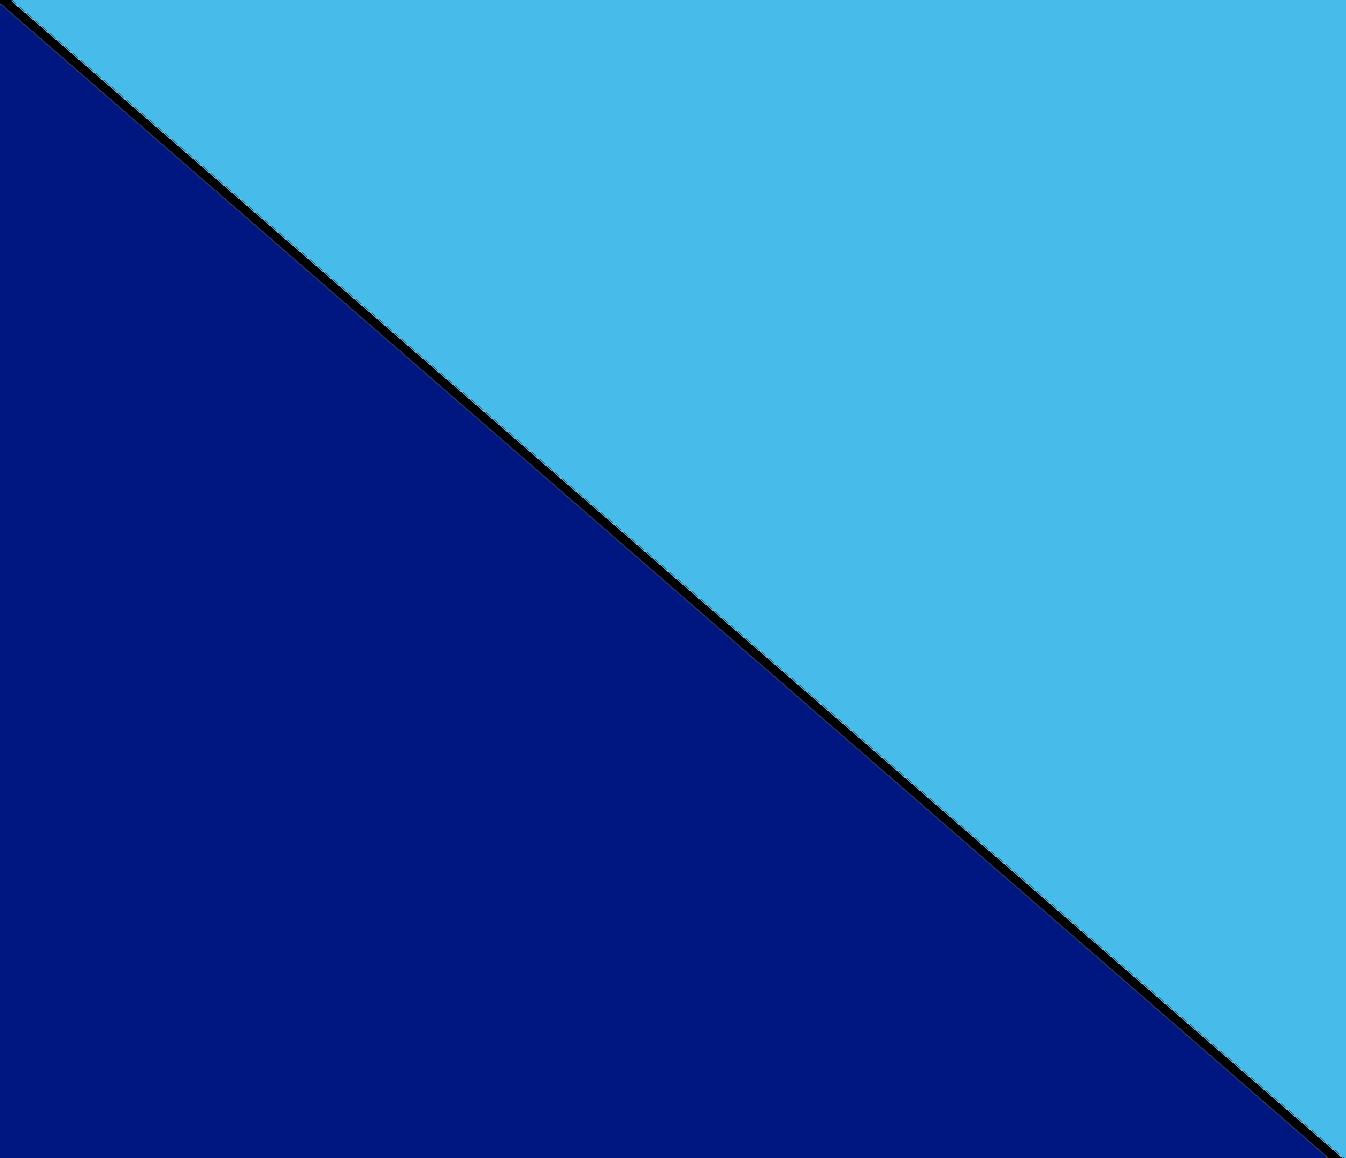 marino-celeste